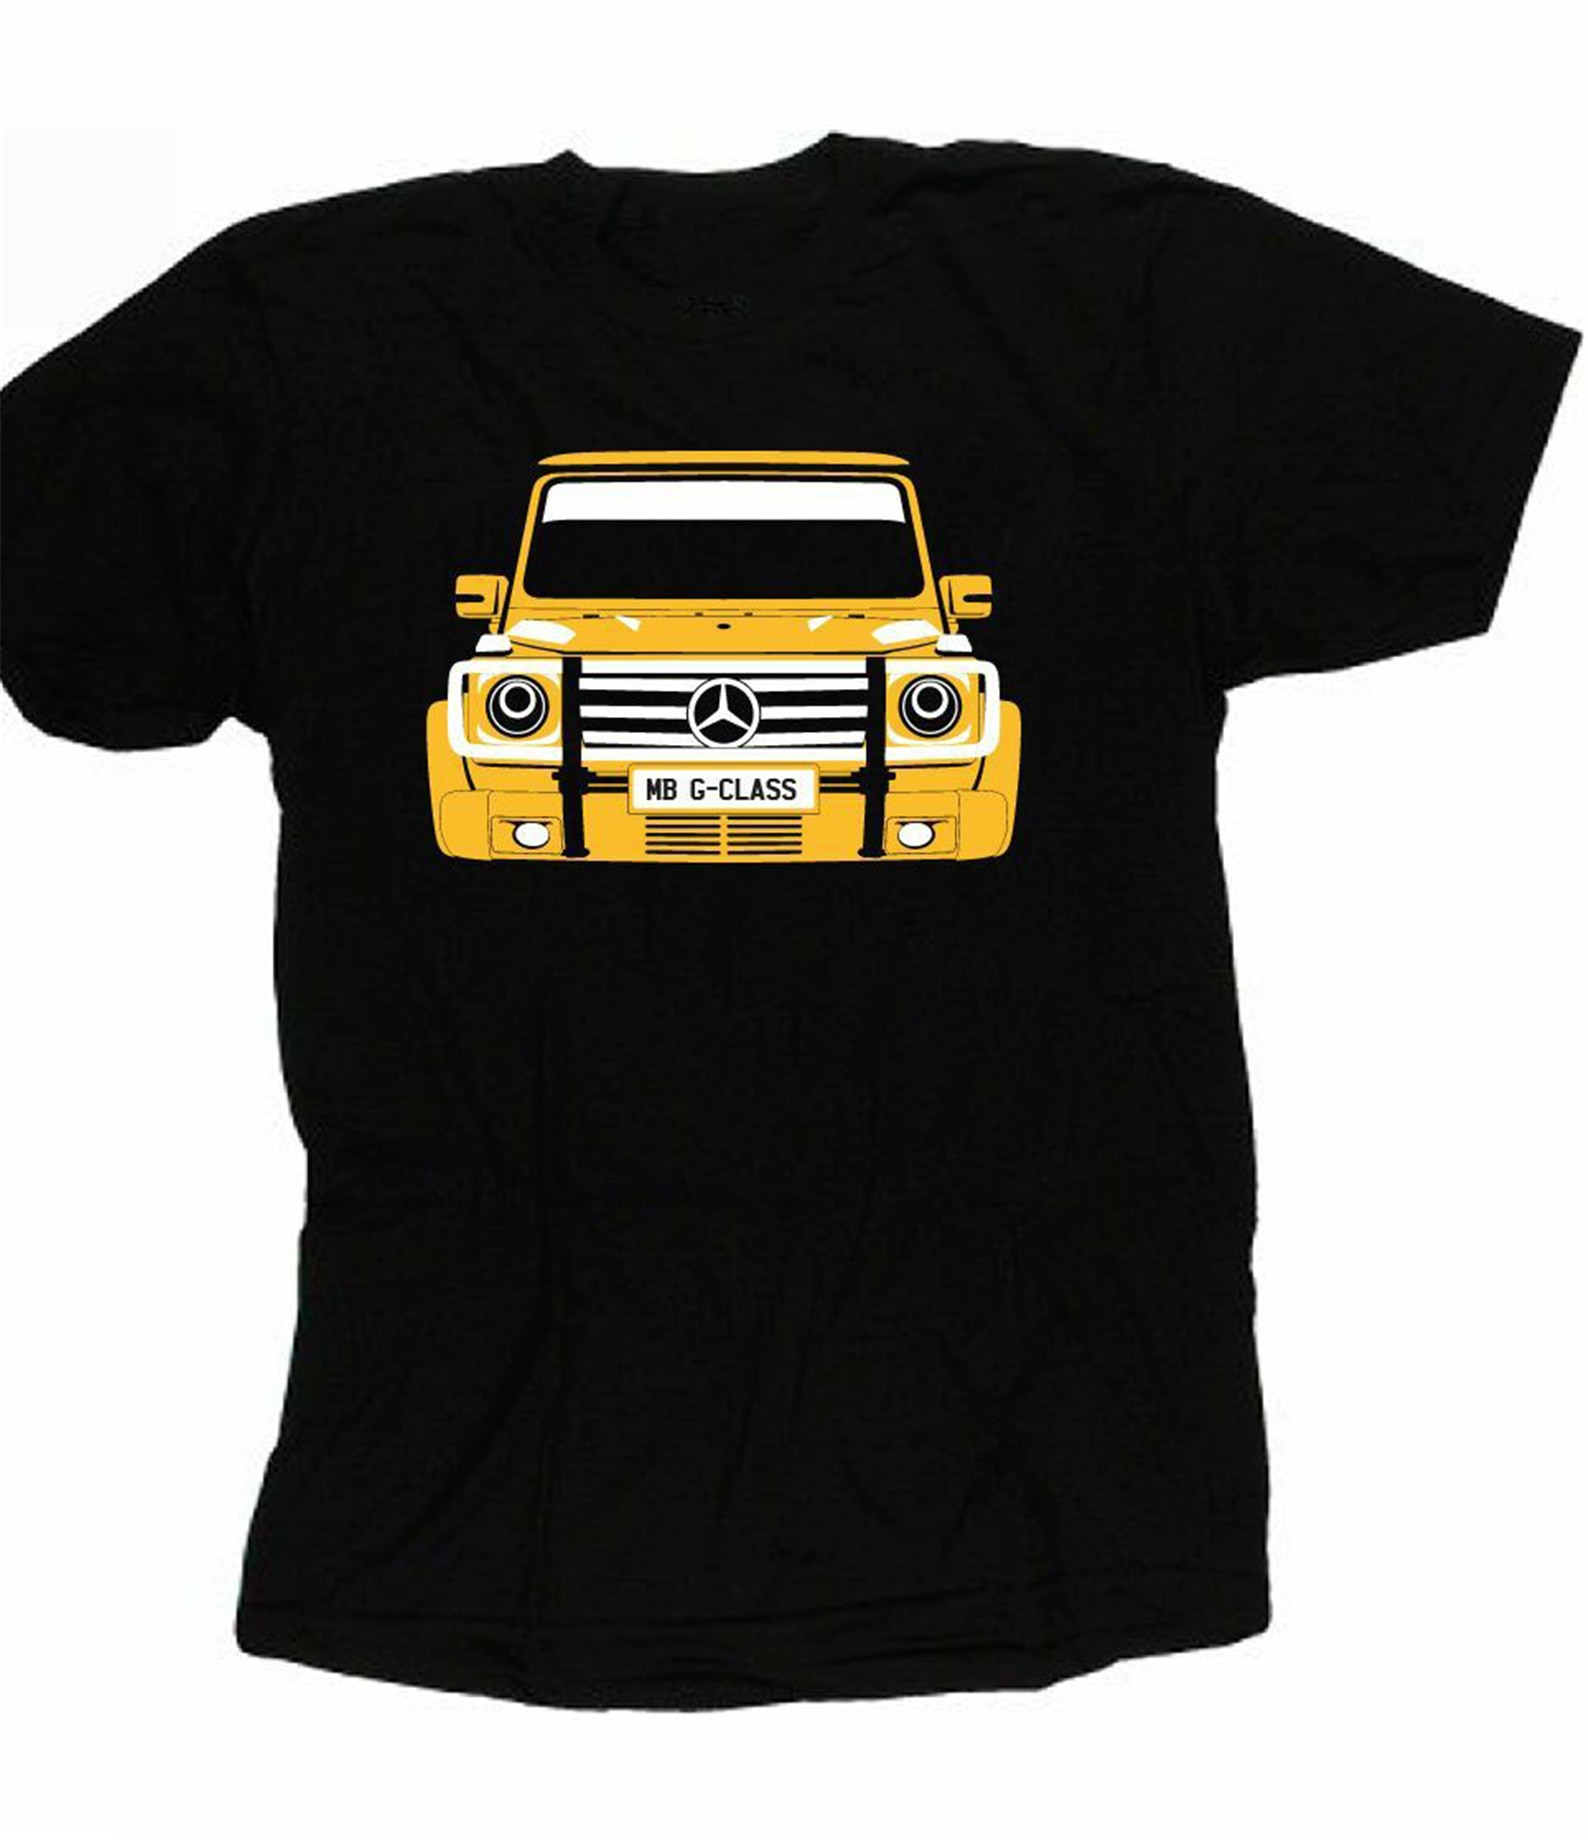 Camiseta personalizada, MB, clase G, G-Wagen 463, Merc, selección de placa de color de coche, modelos básicos Benzy, camiseta